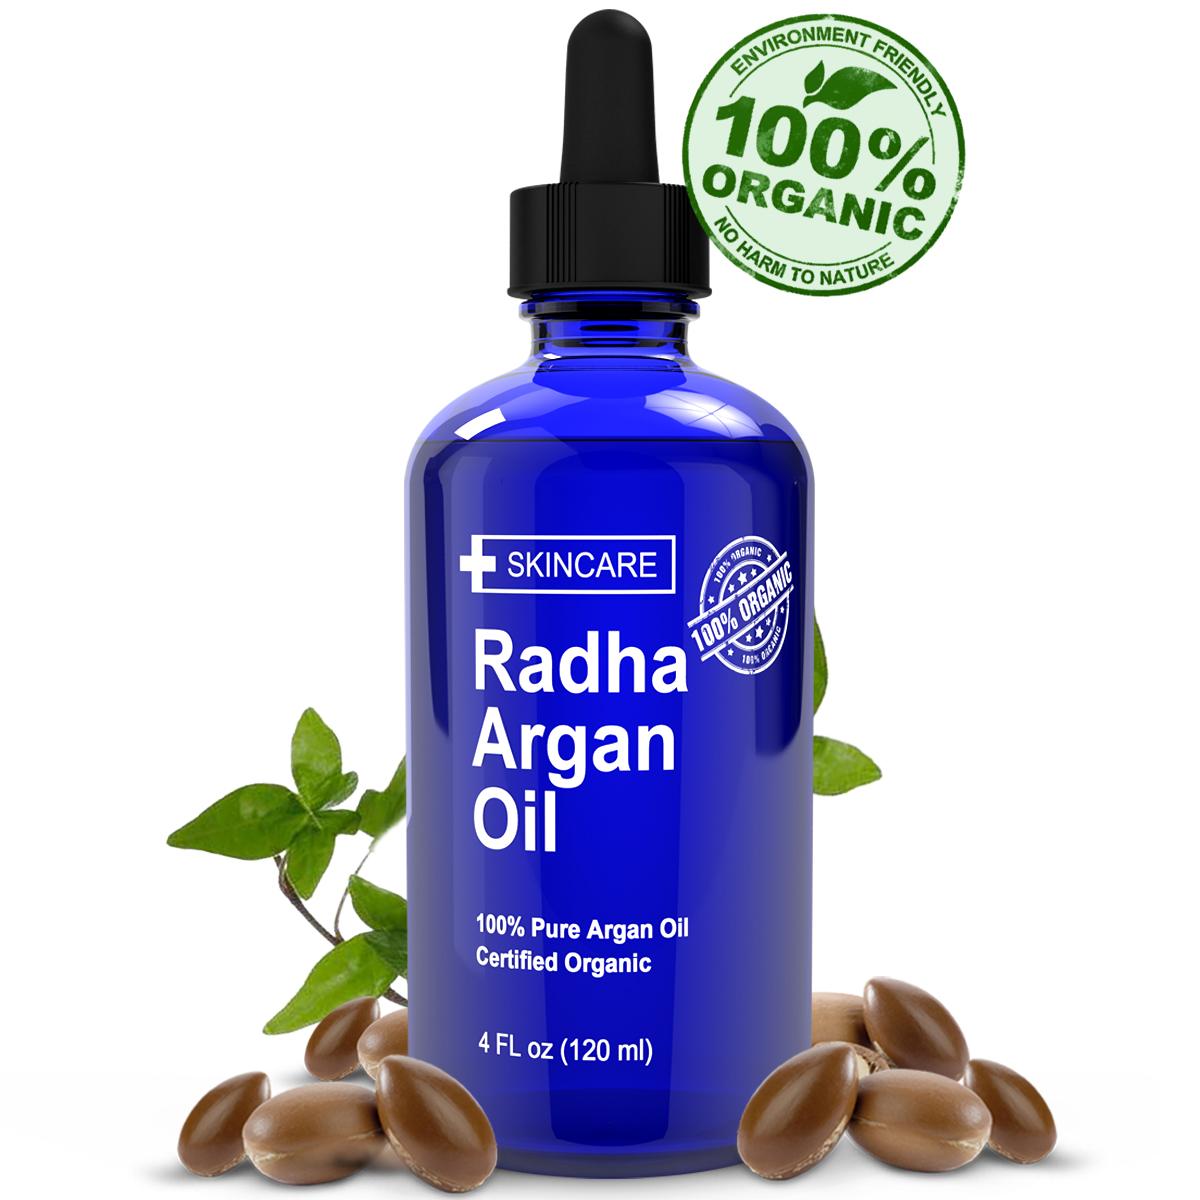 Radha Argan Oil